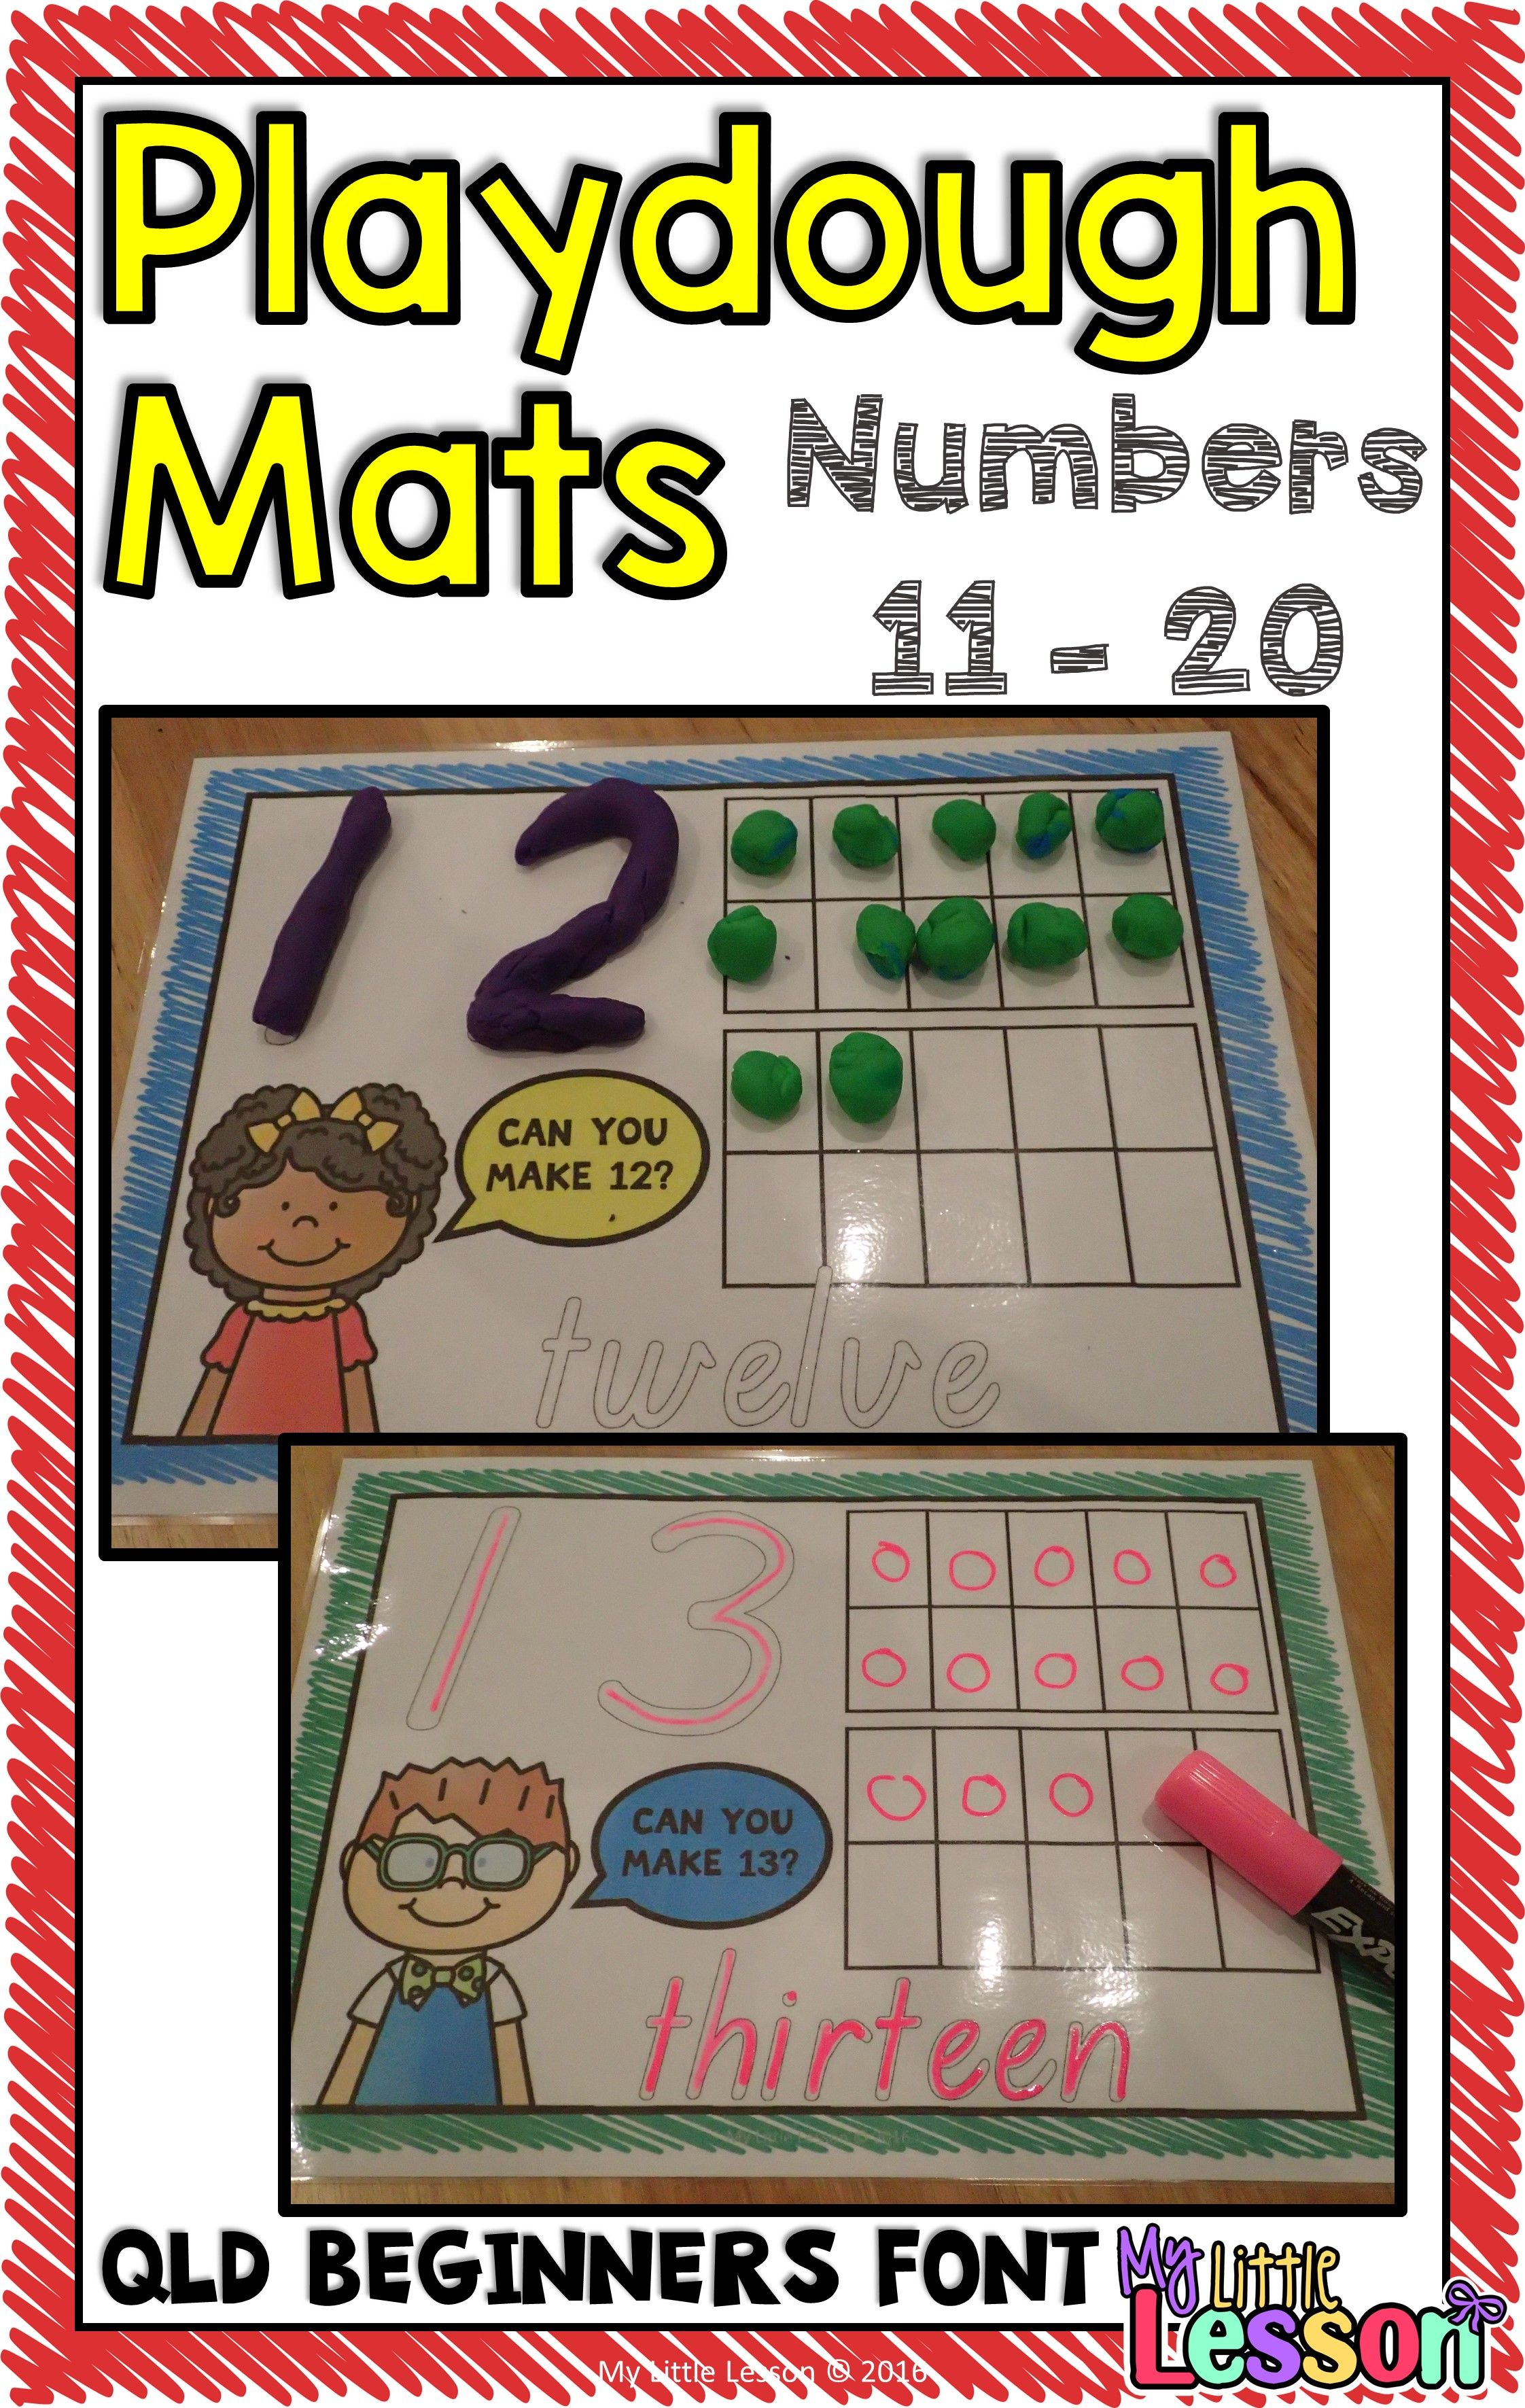 Playdough Mats Numbers 11 20 Qld Beginners Font